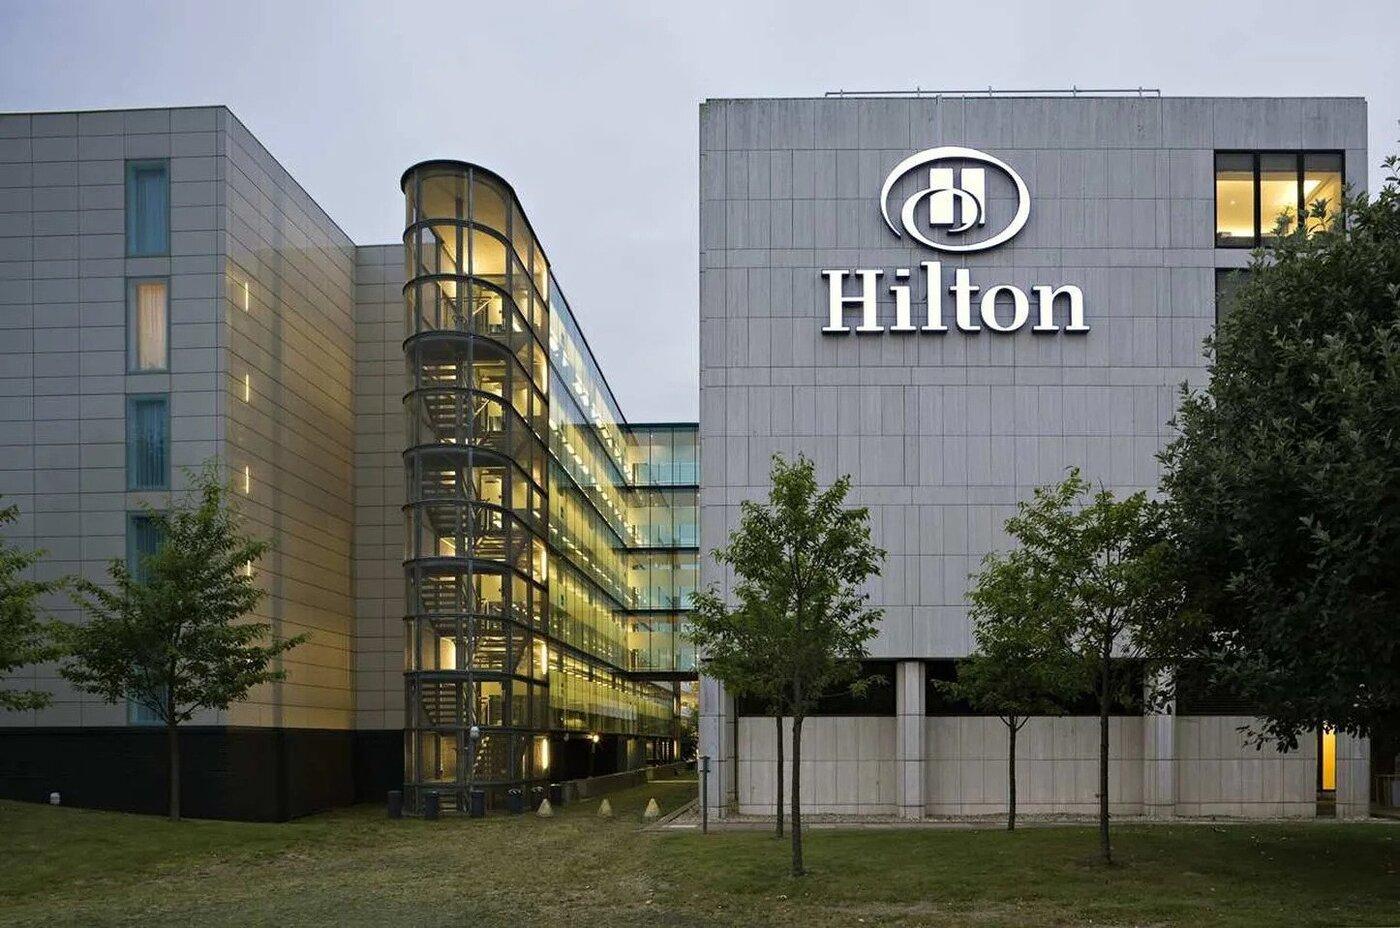 HIlton Hotels is leaving Tesco Clubcard